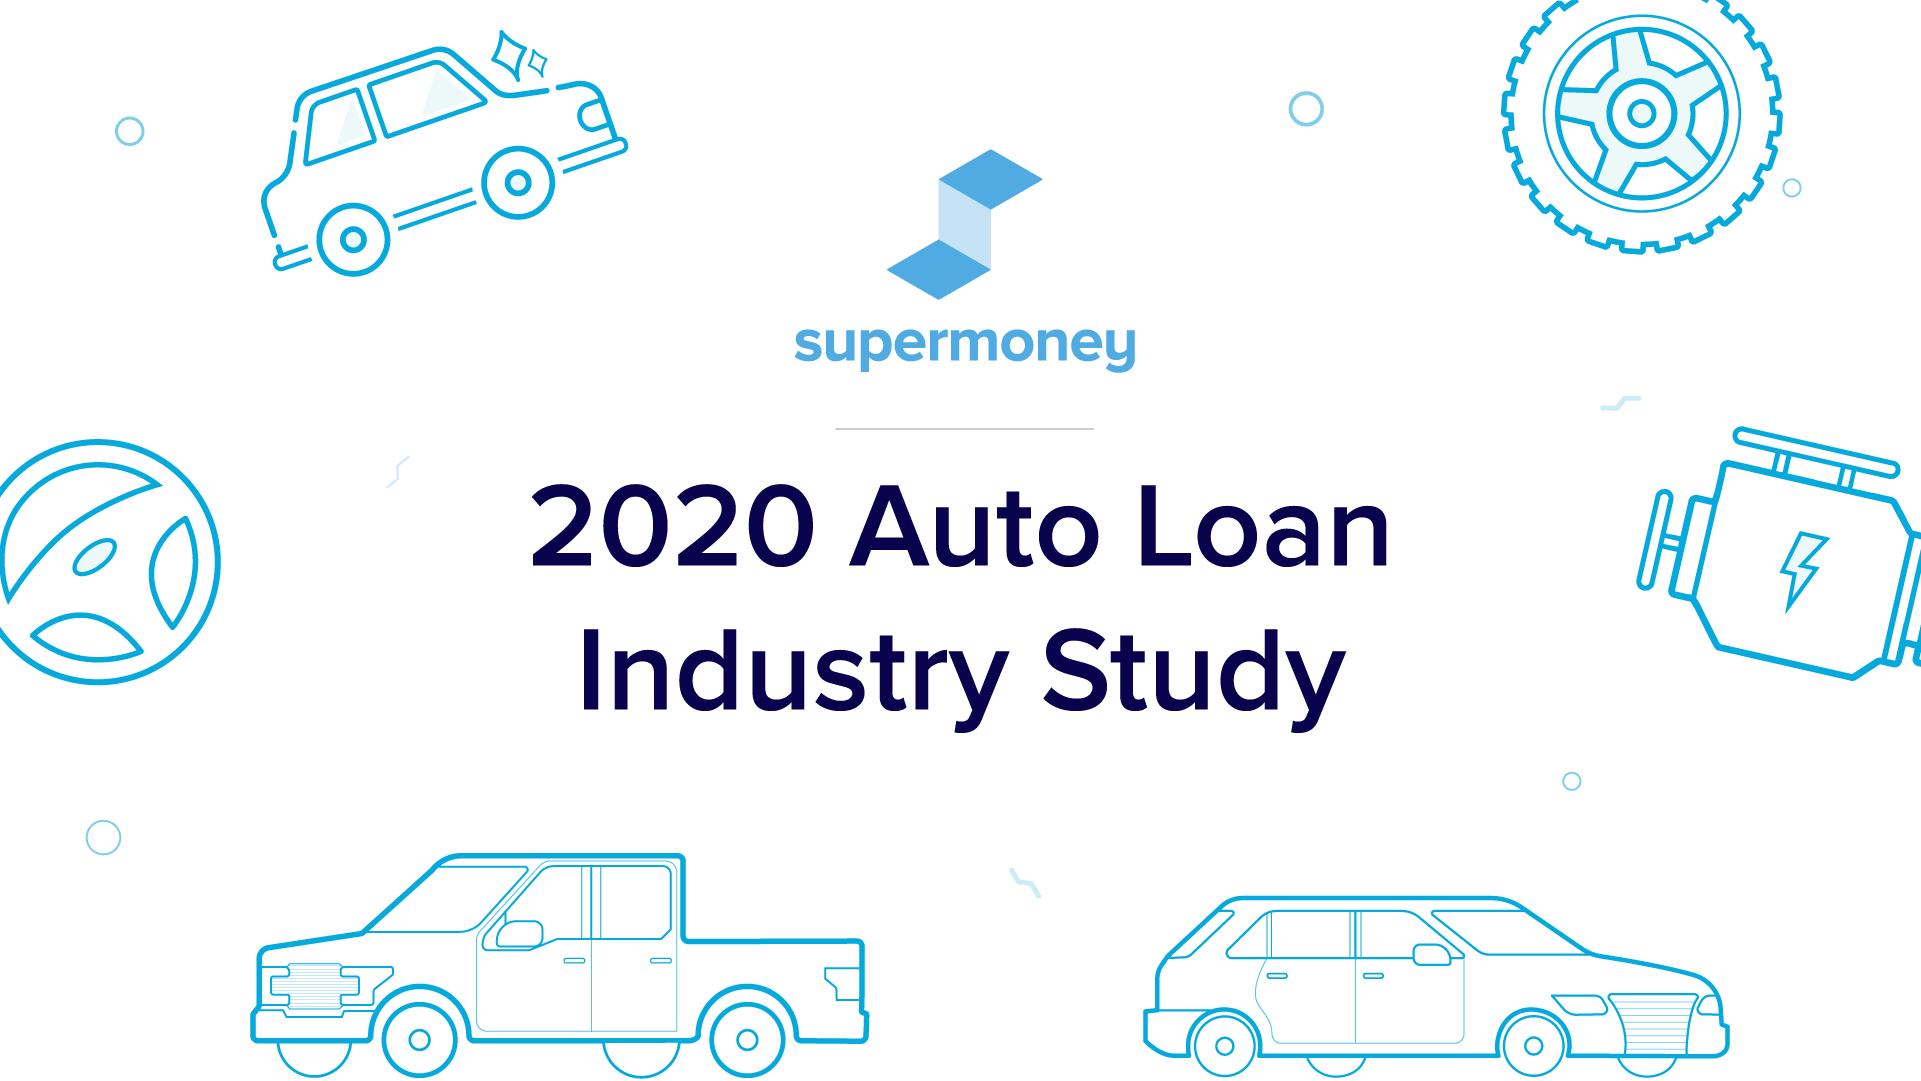 SuperMoney auto loan